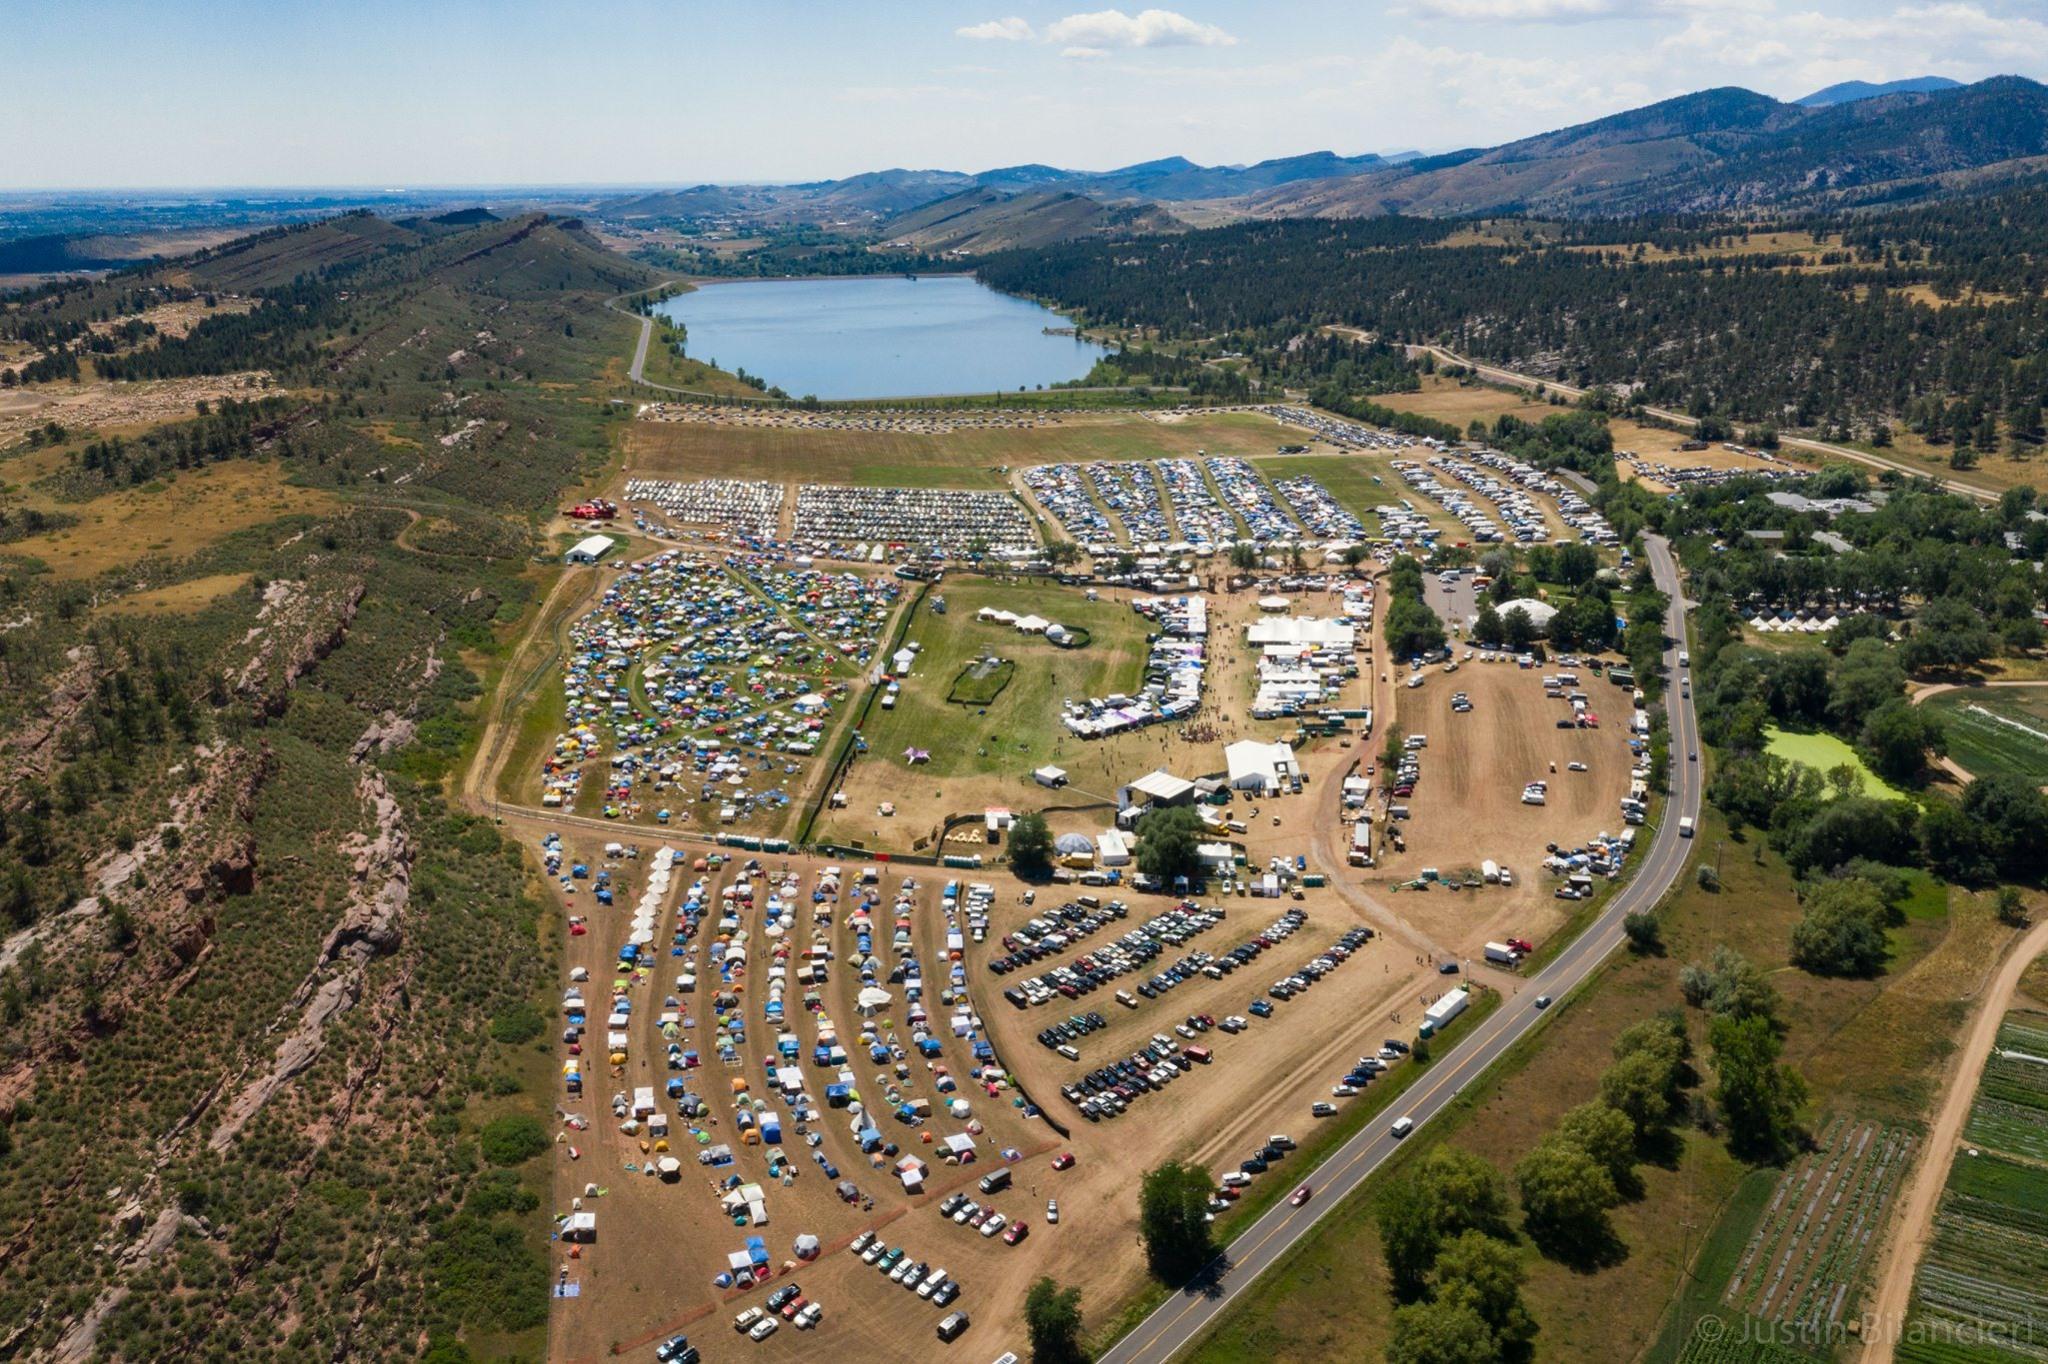 Aerial view of Arise Music Festival - Larimer County, Colorado